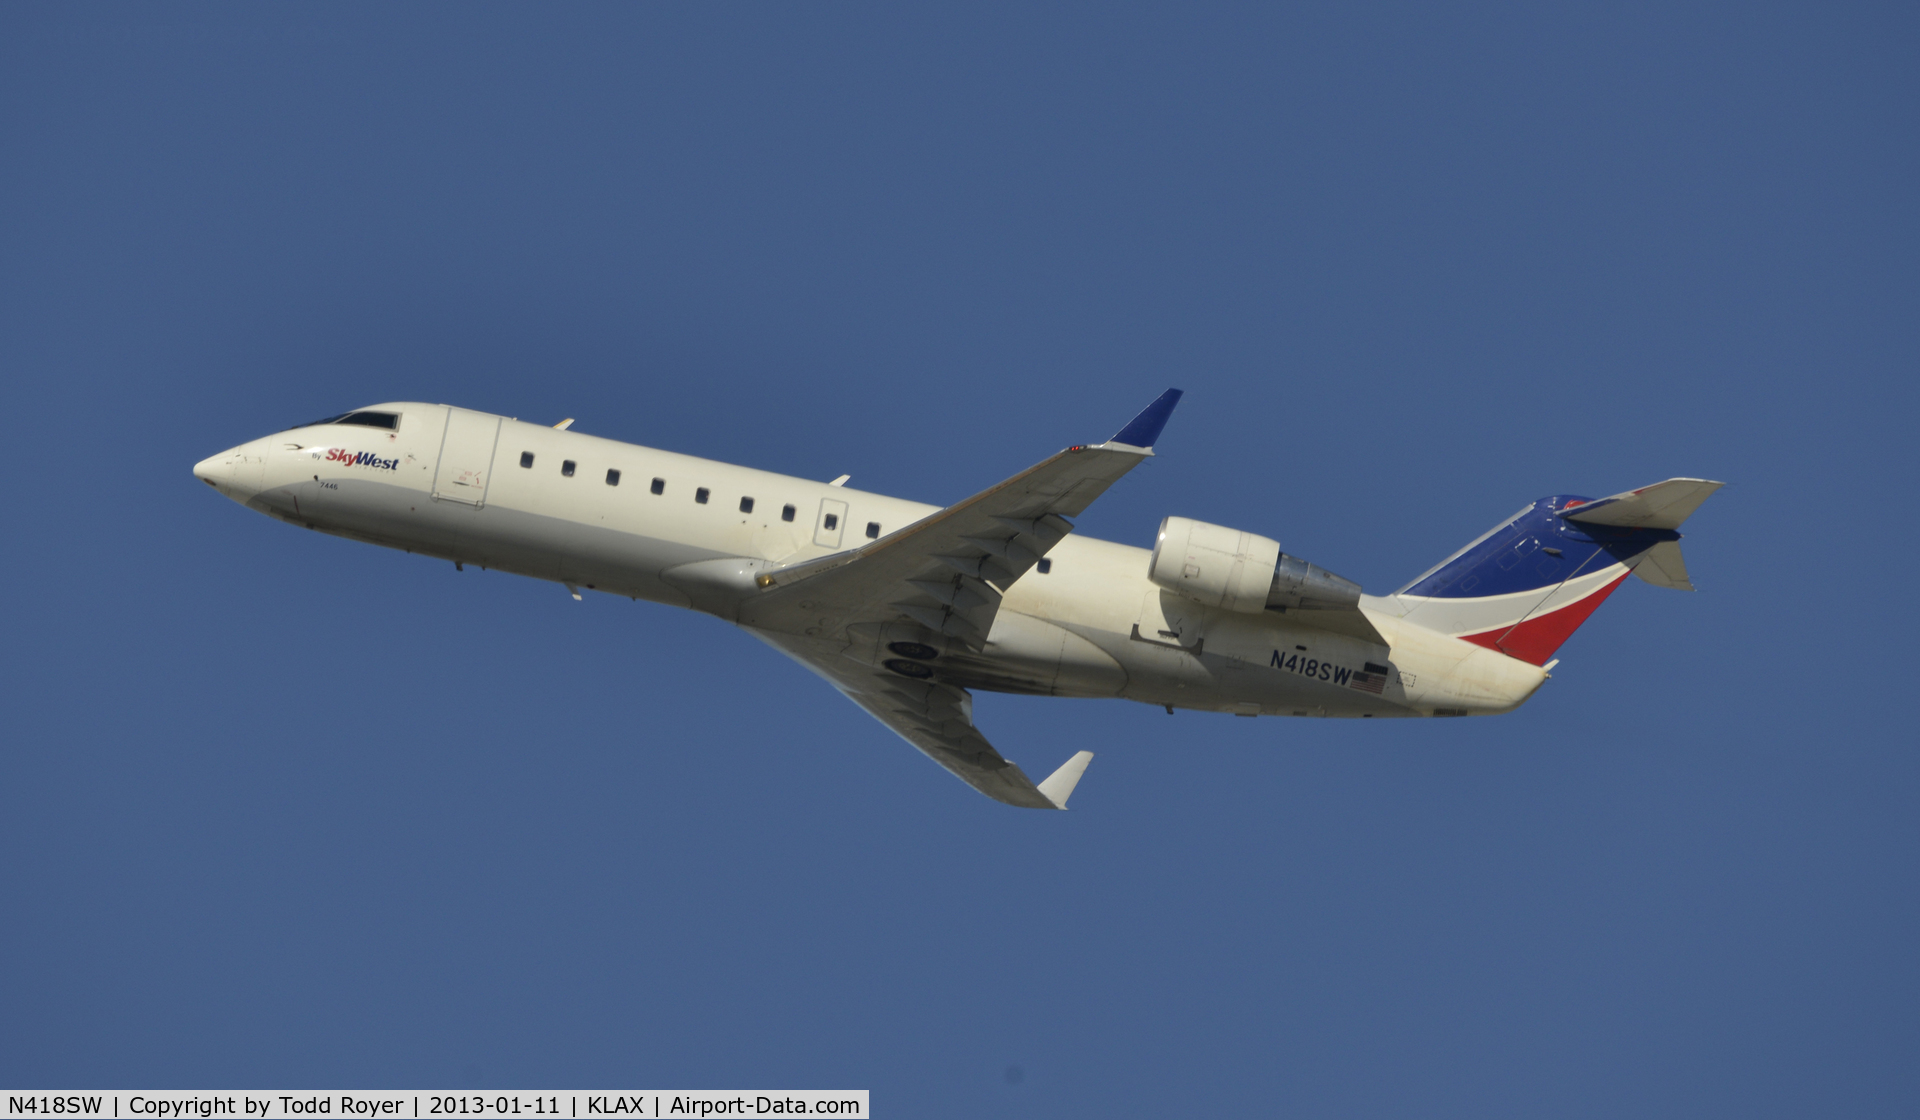 N418SW, 2000 Bombardier CRJ-200LR (CL-600-2B19) C/N 7446, Departing LAX